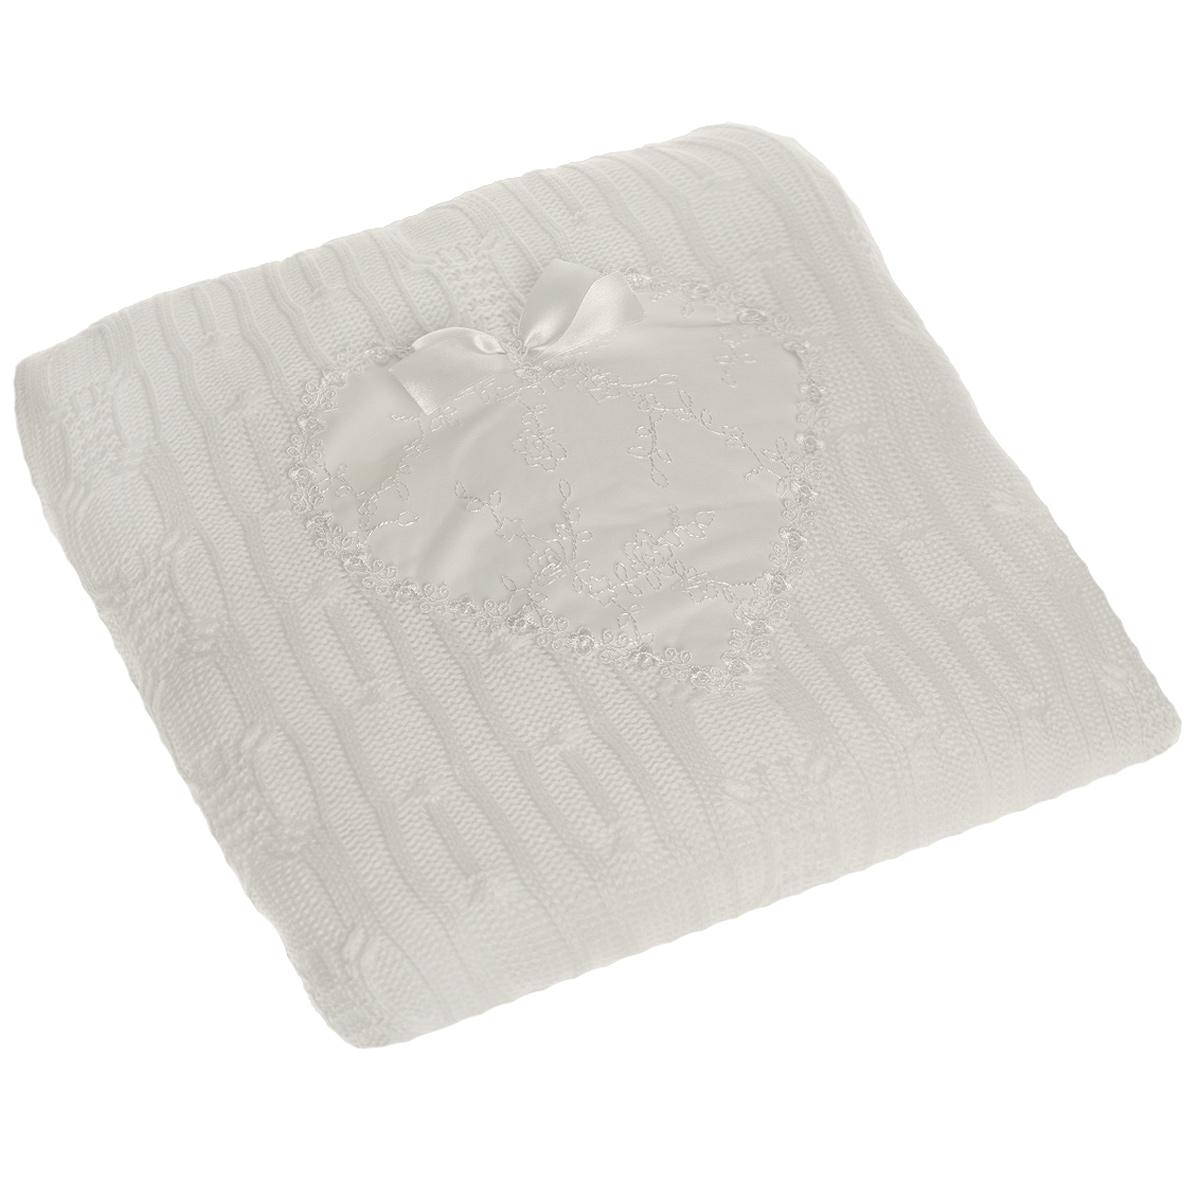 Одеяло-плед Сонный гномик